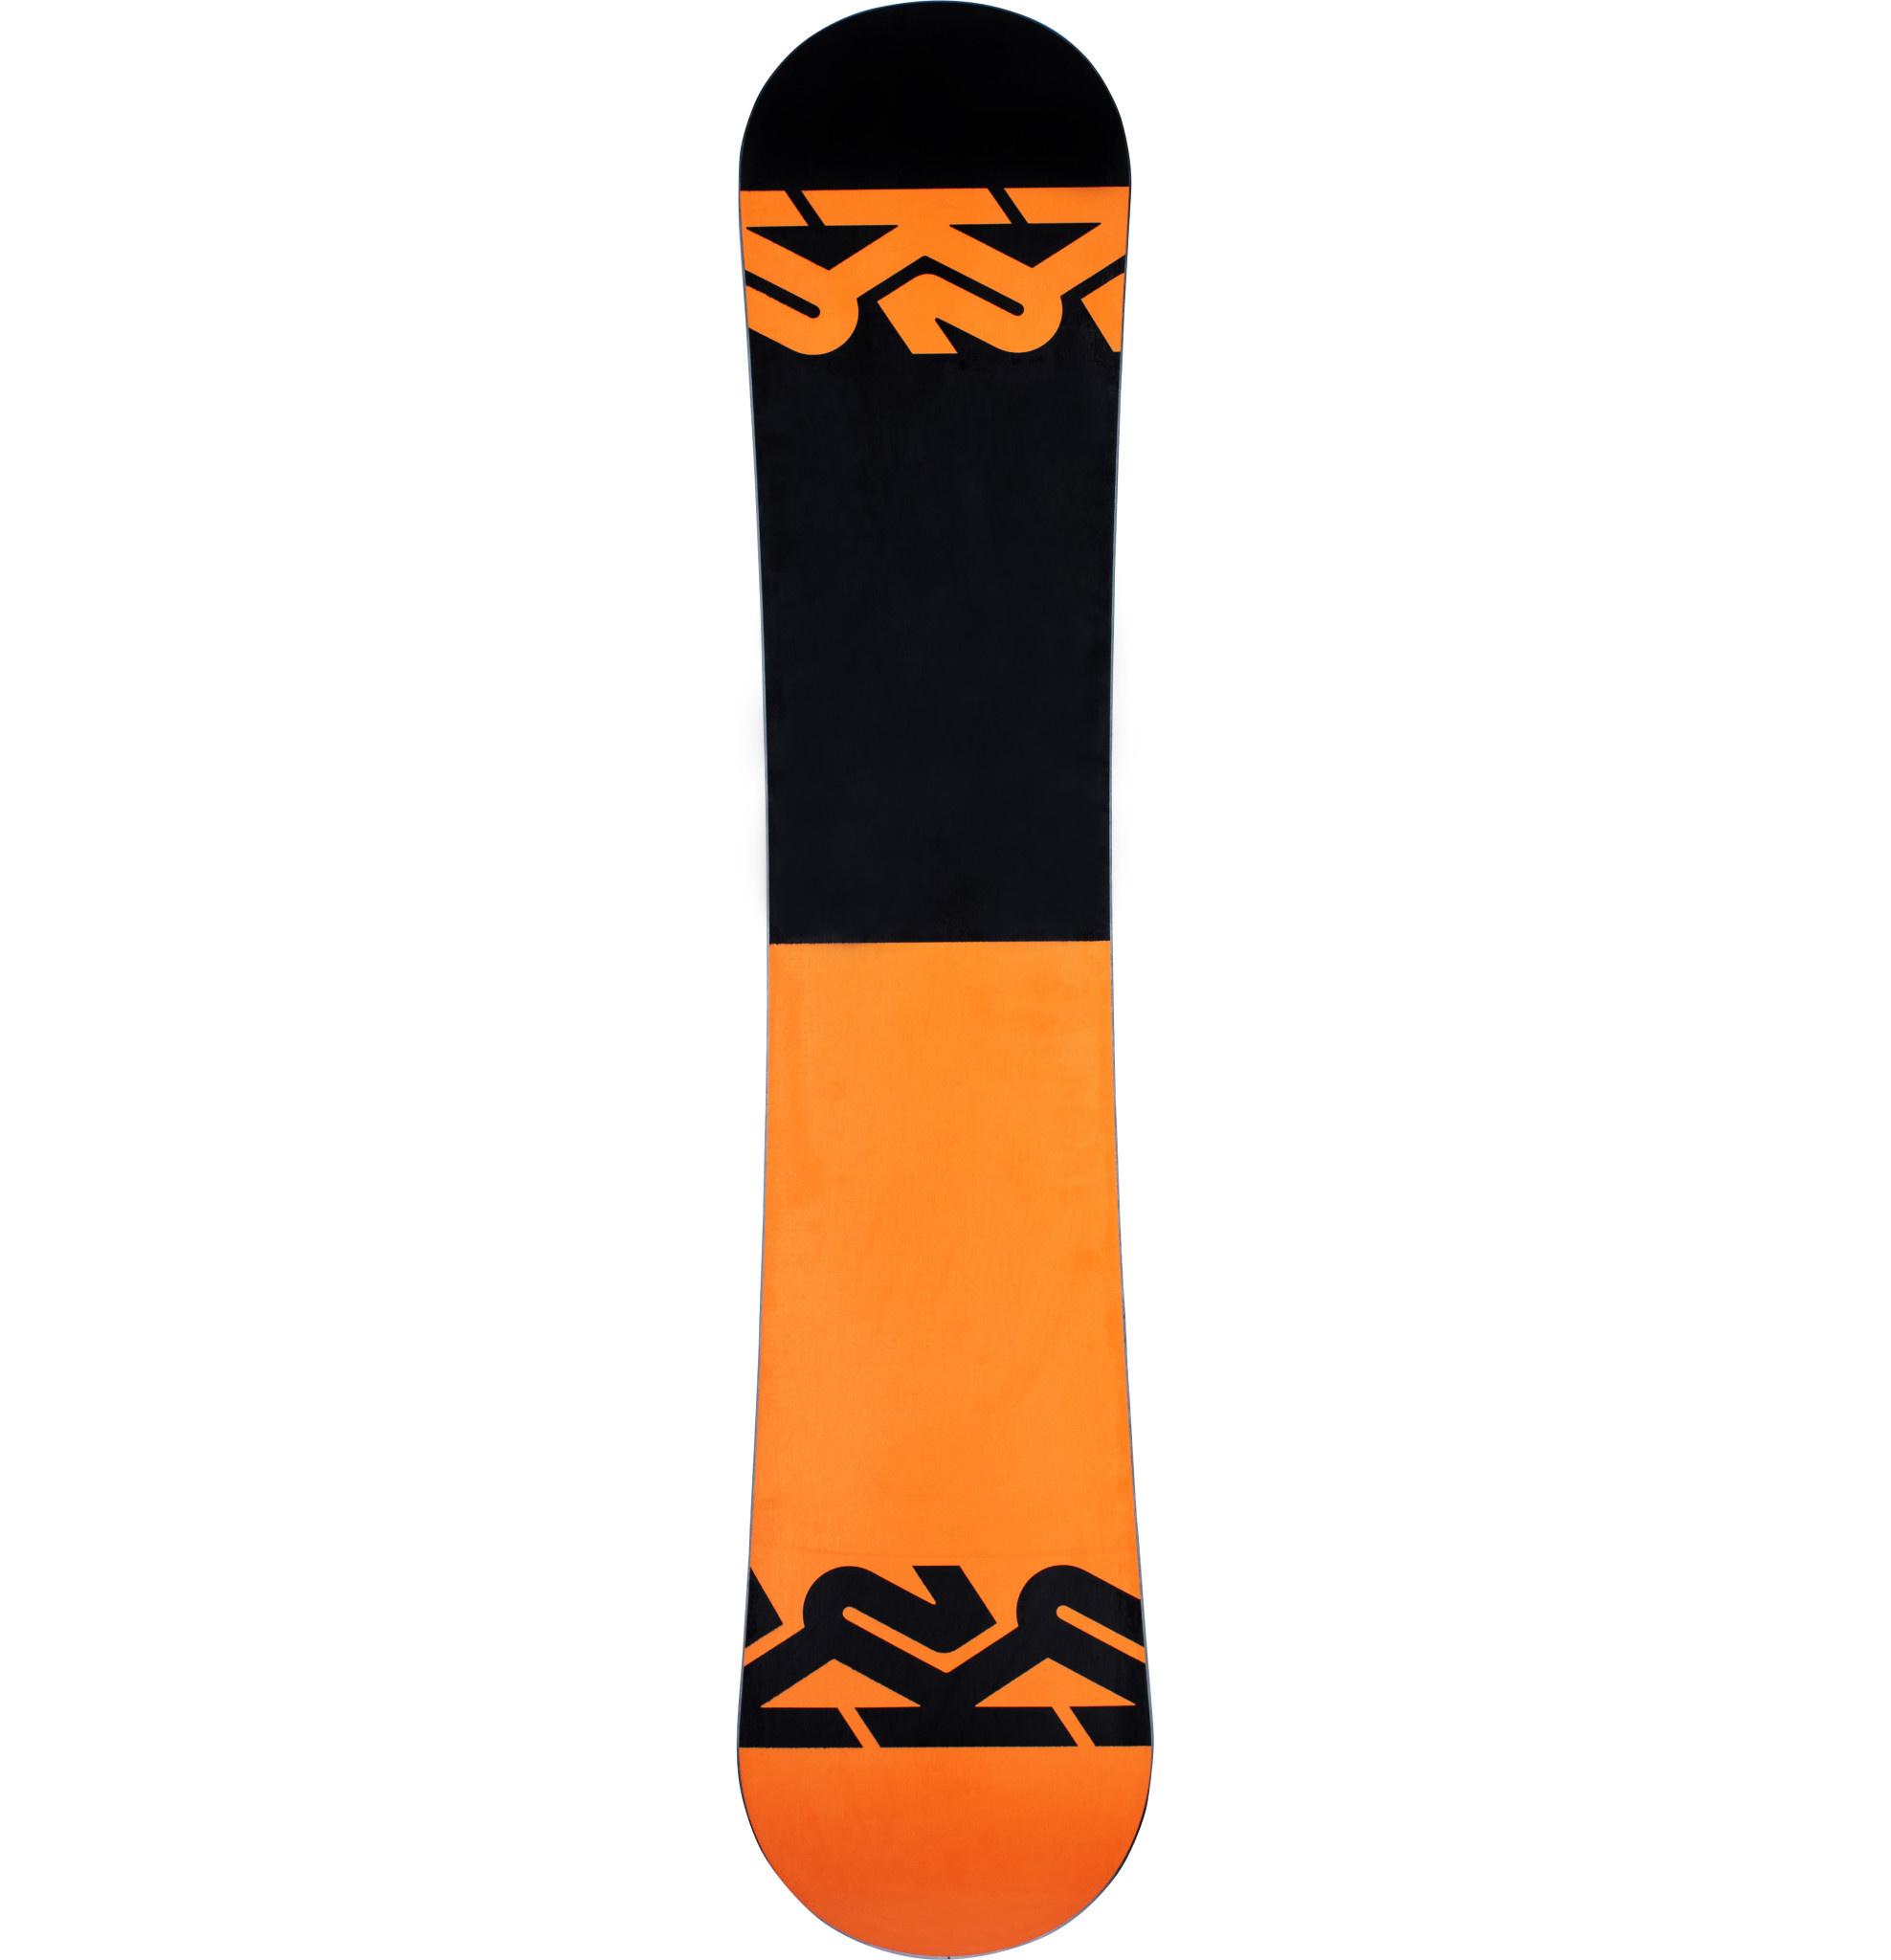 K2 Snowboard K2 Boys Vandal LTD Snowboard